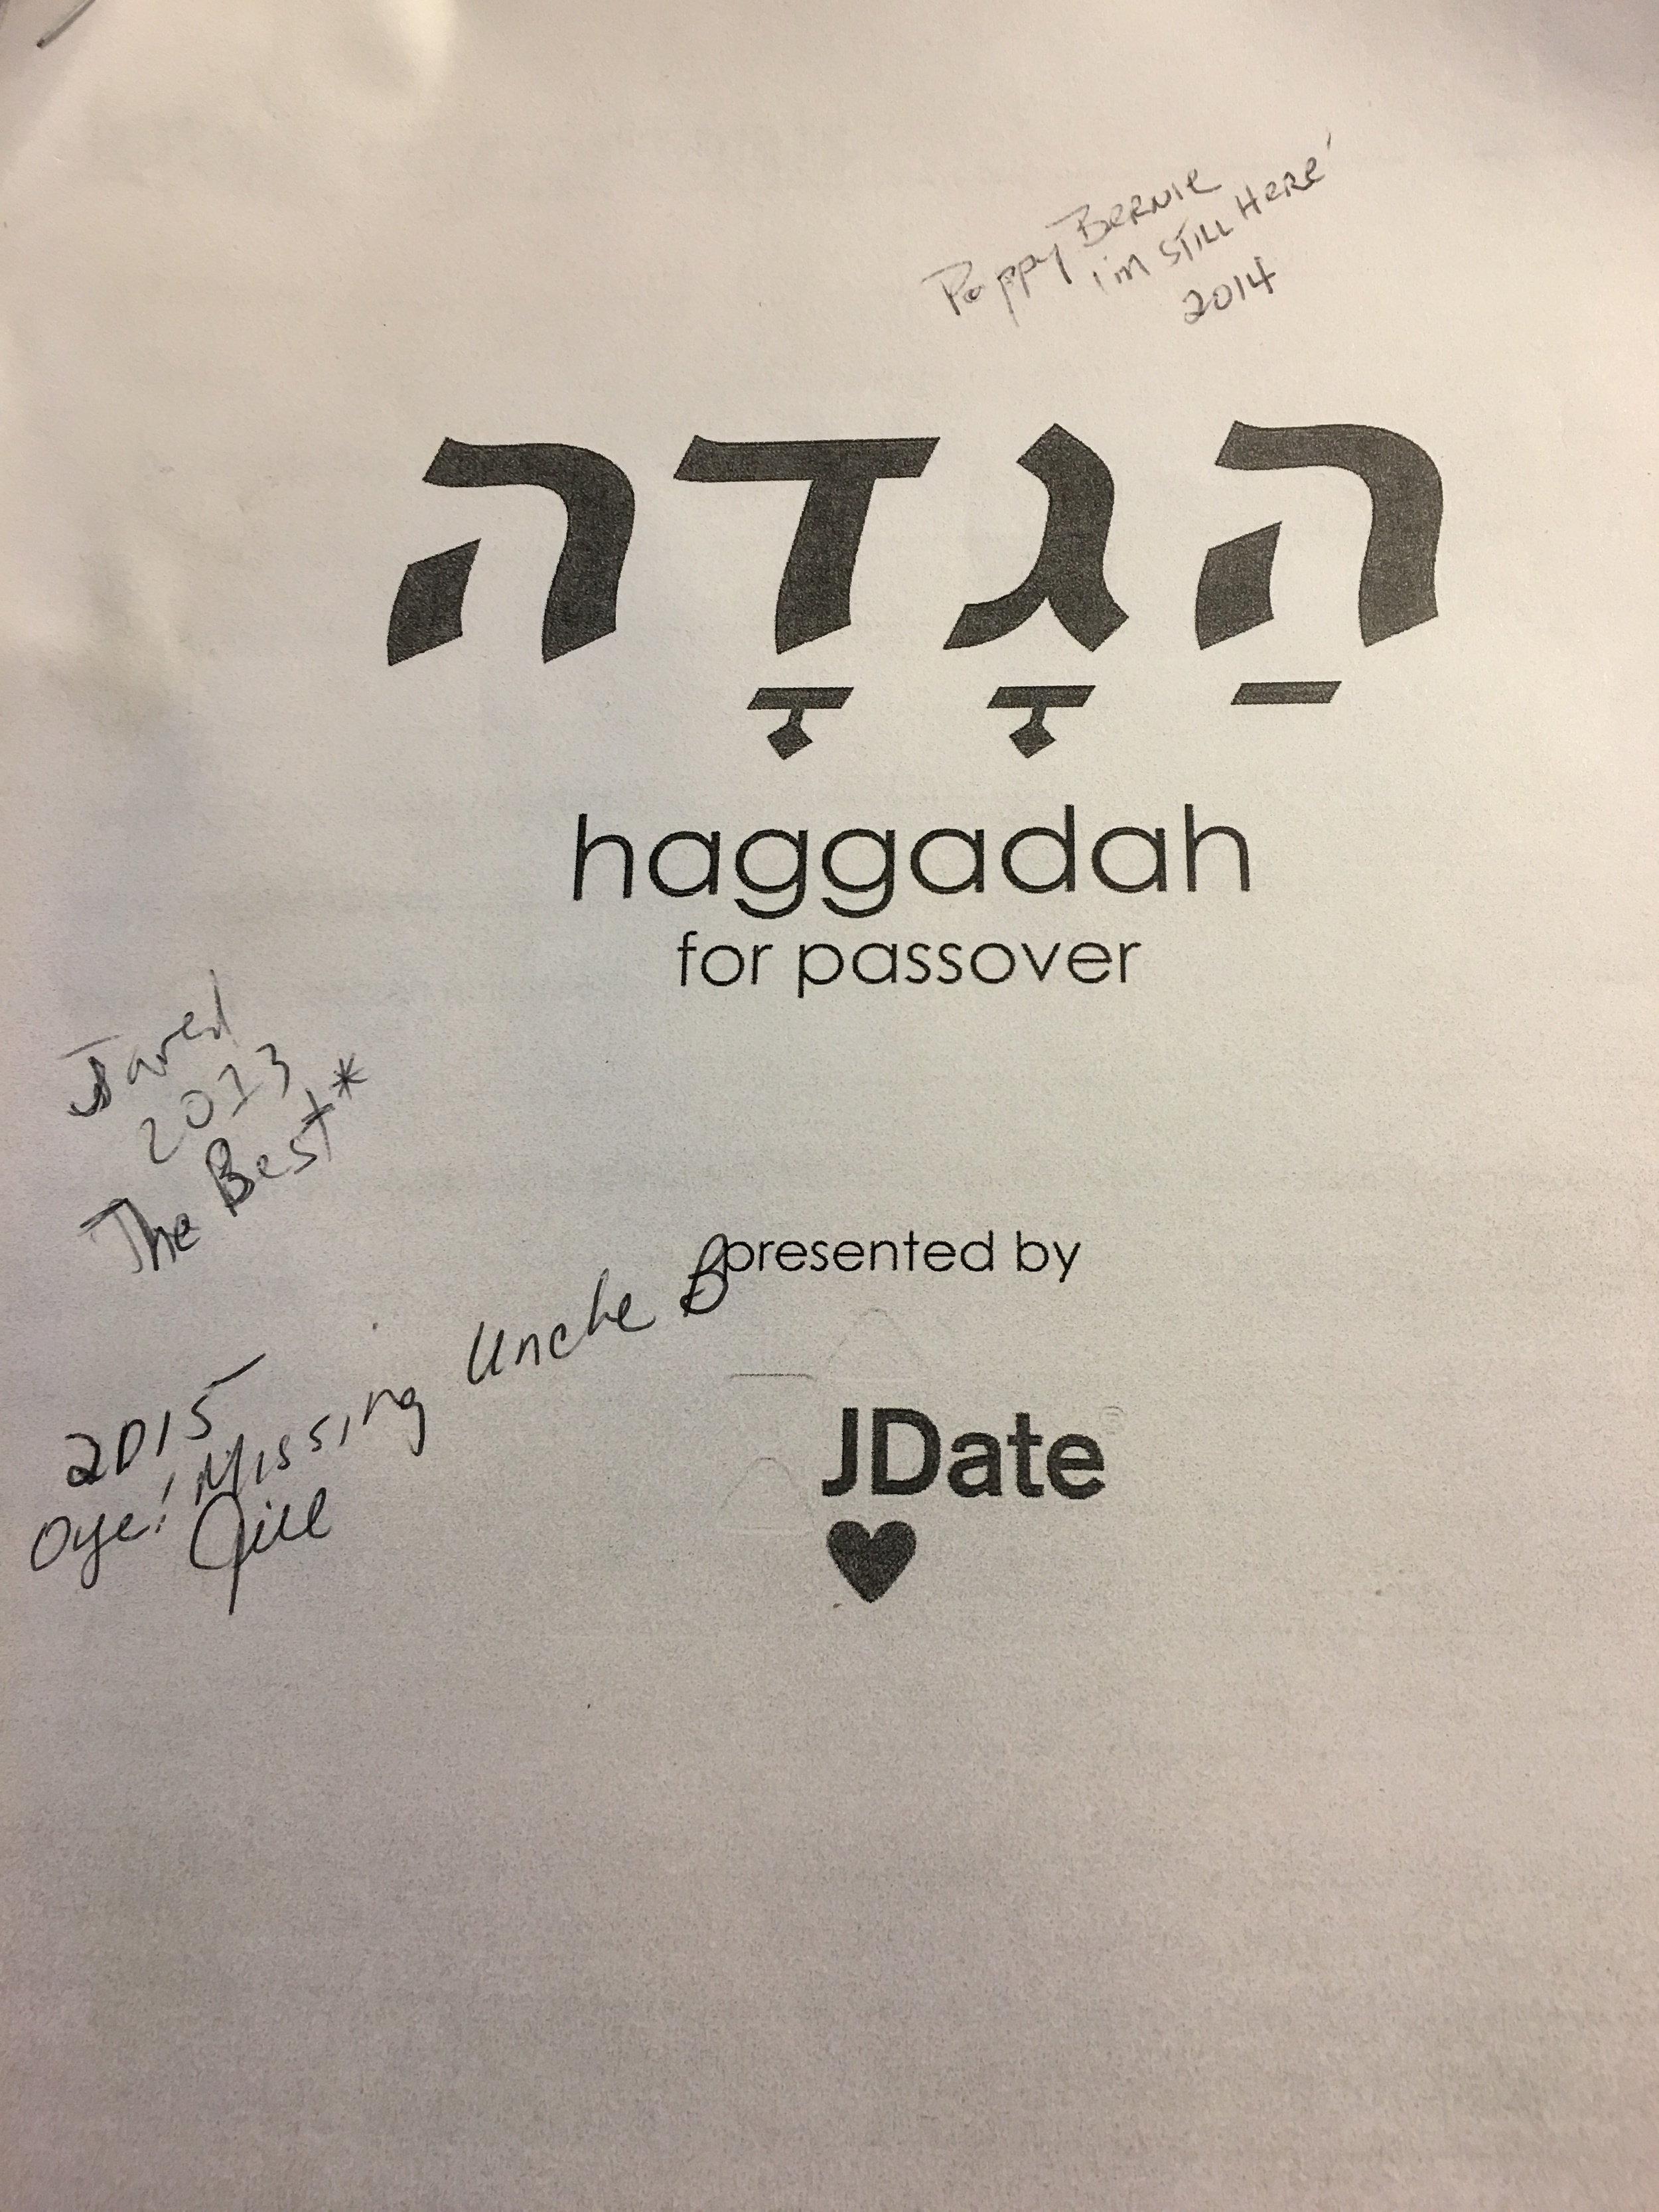 JDate_Haggadah